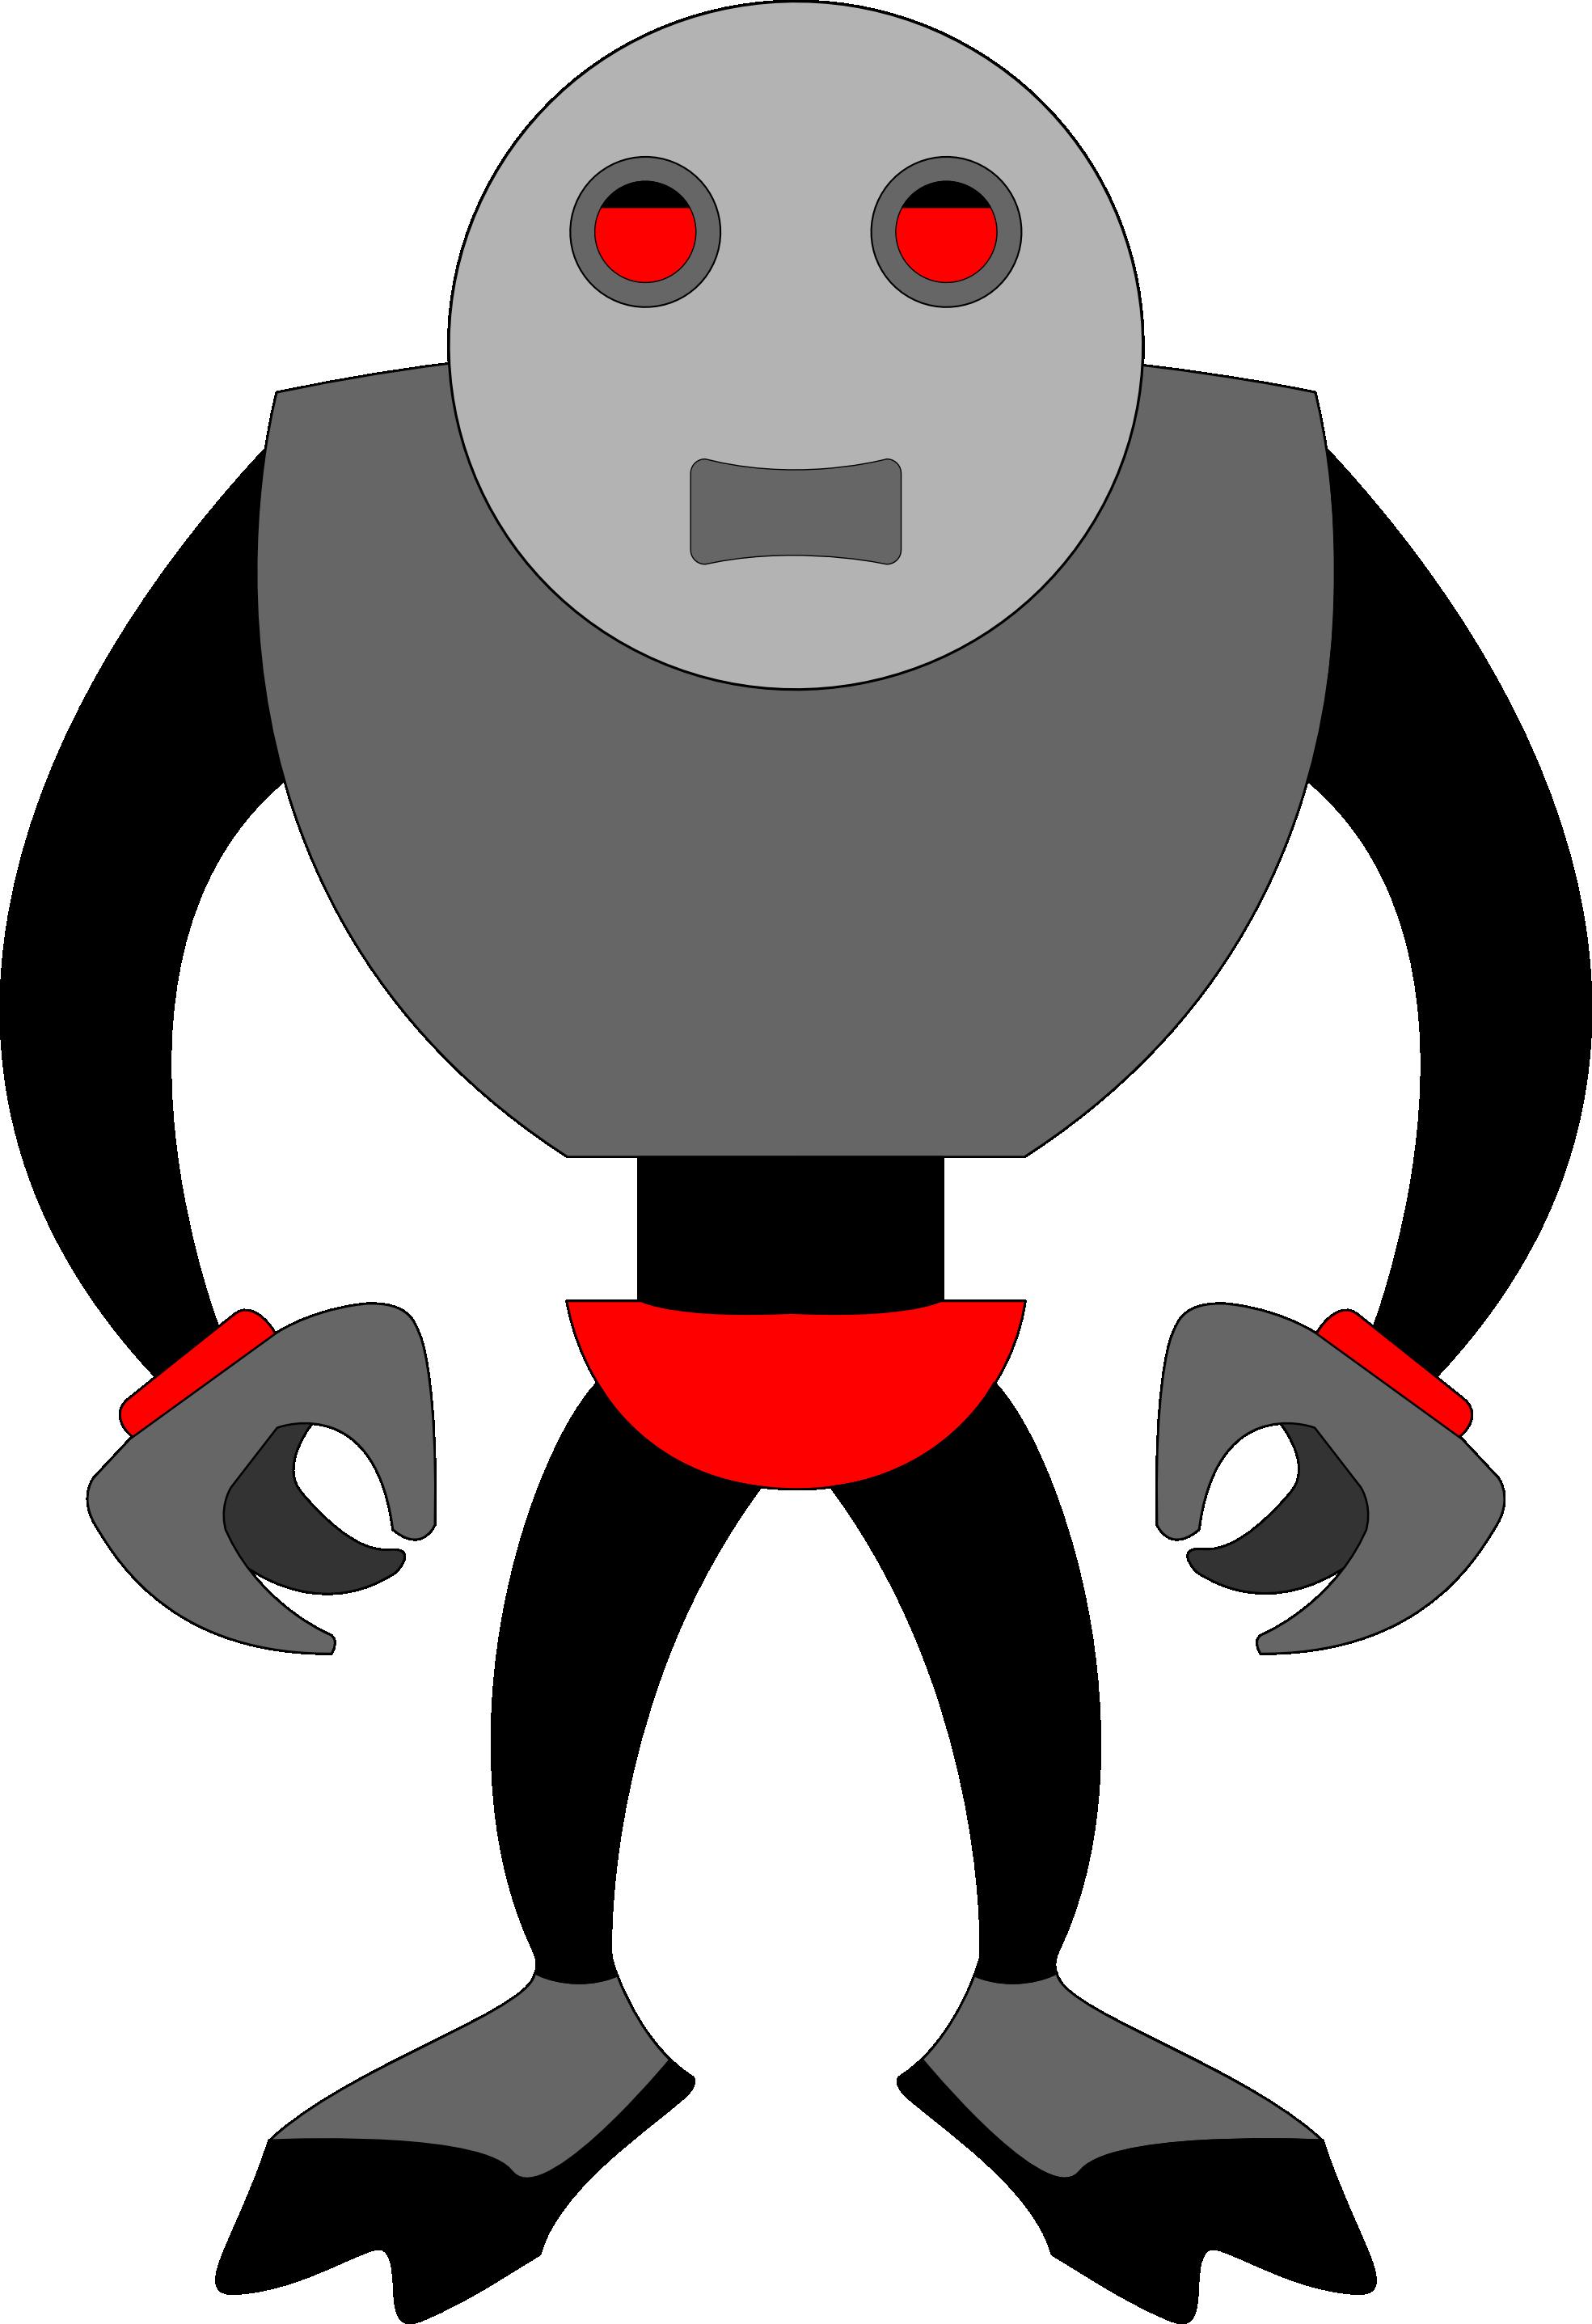 Solidarity panda free images. Party clipart robot